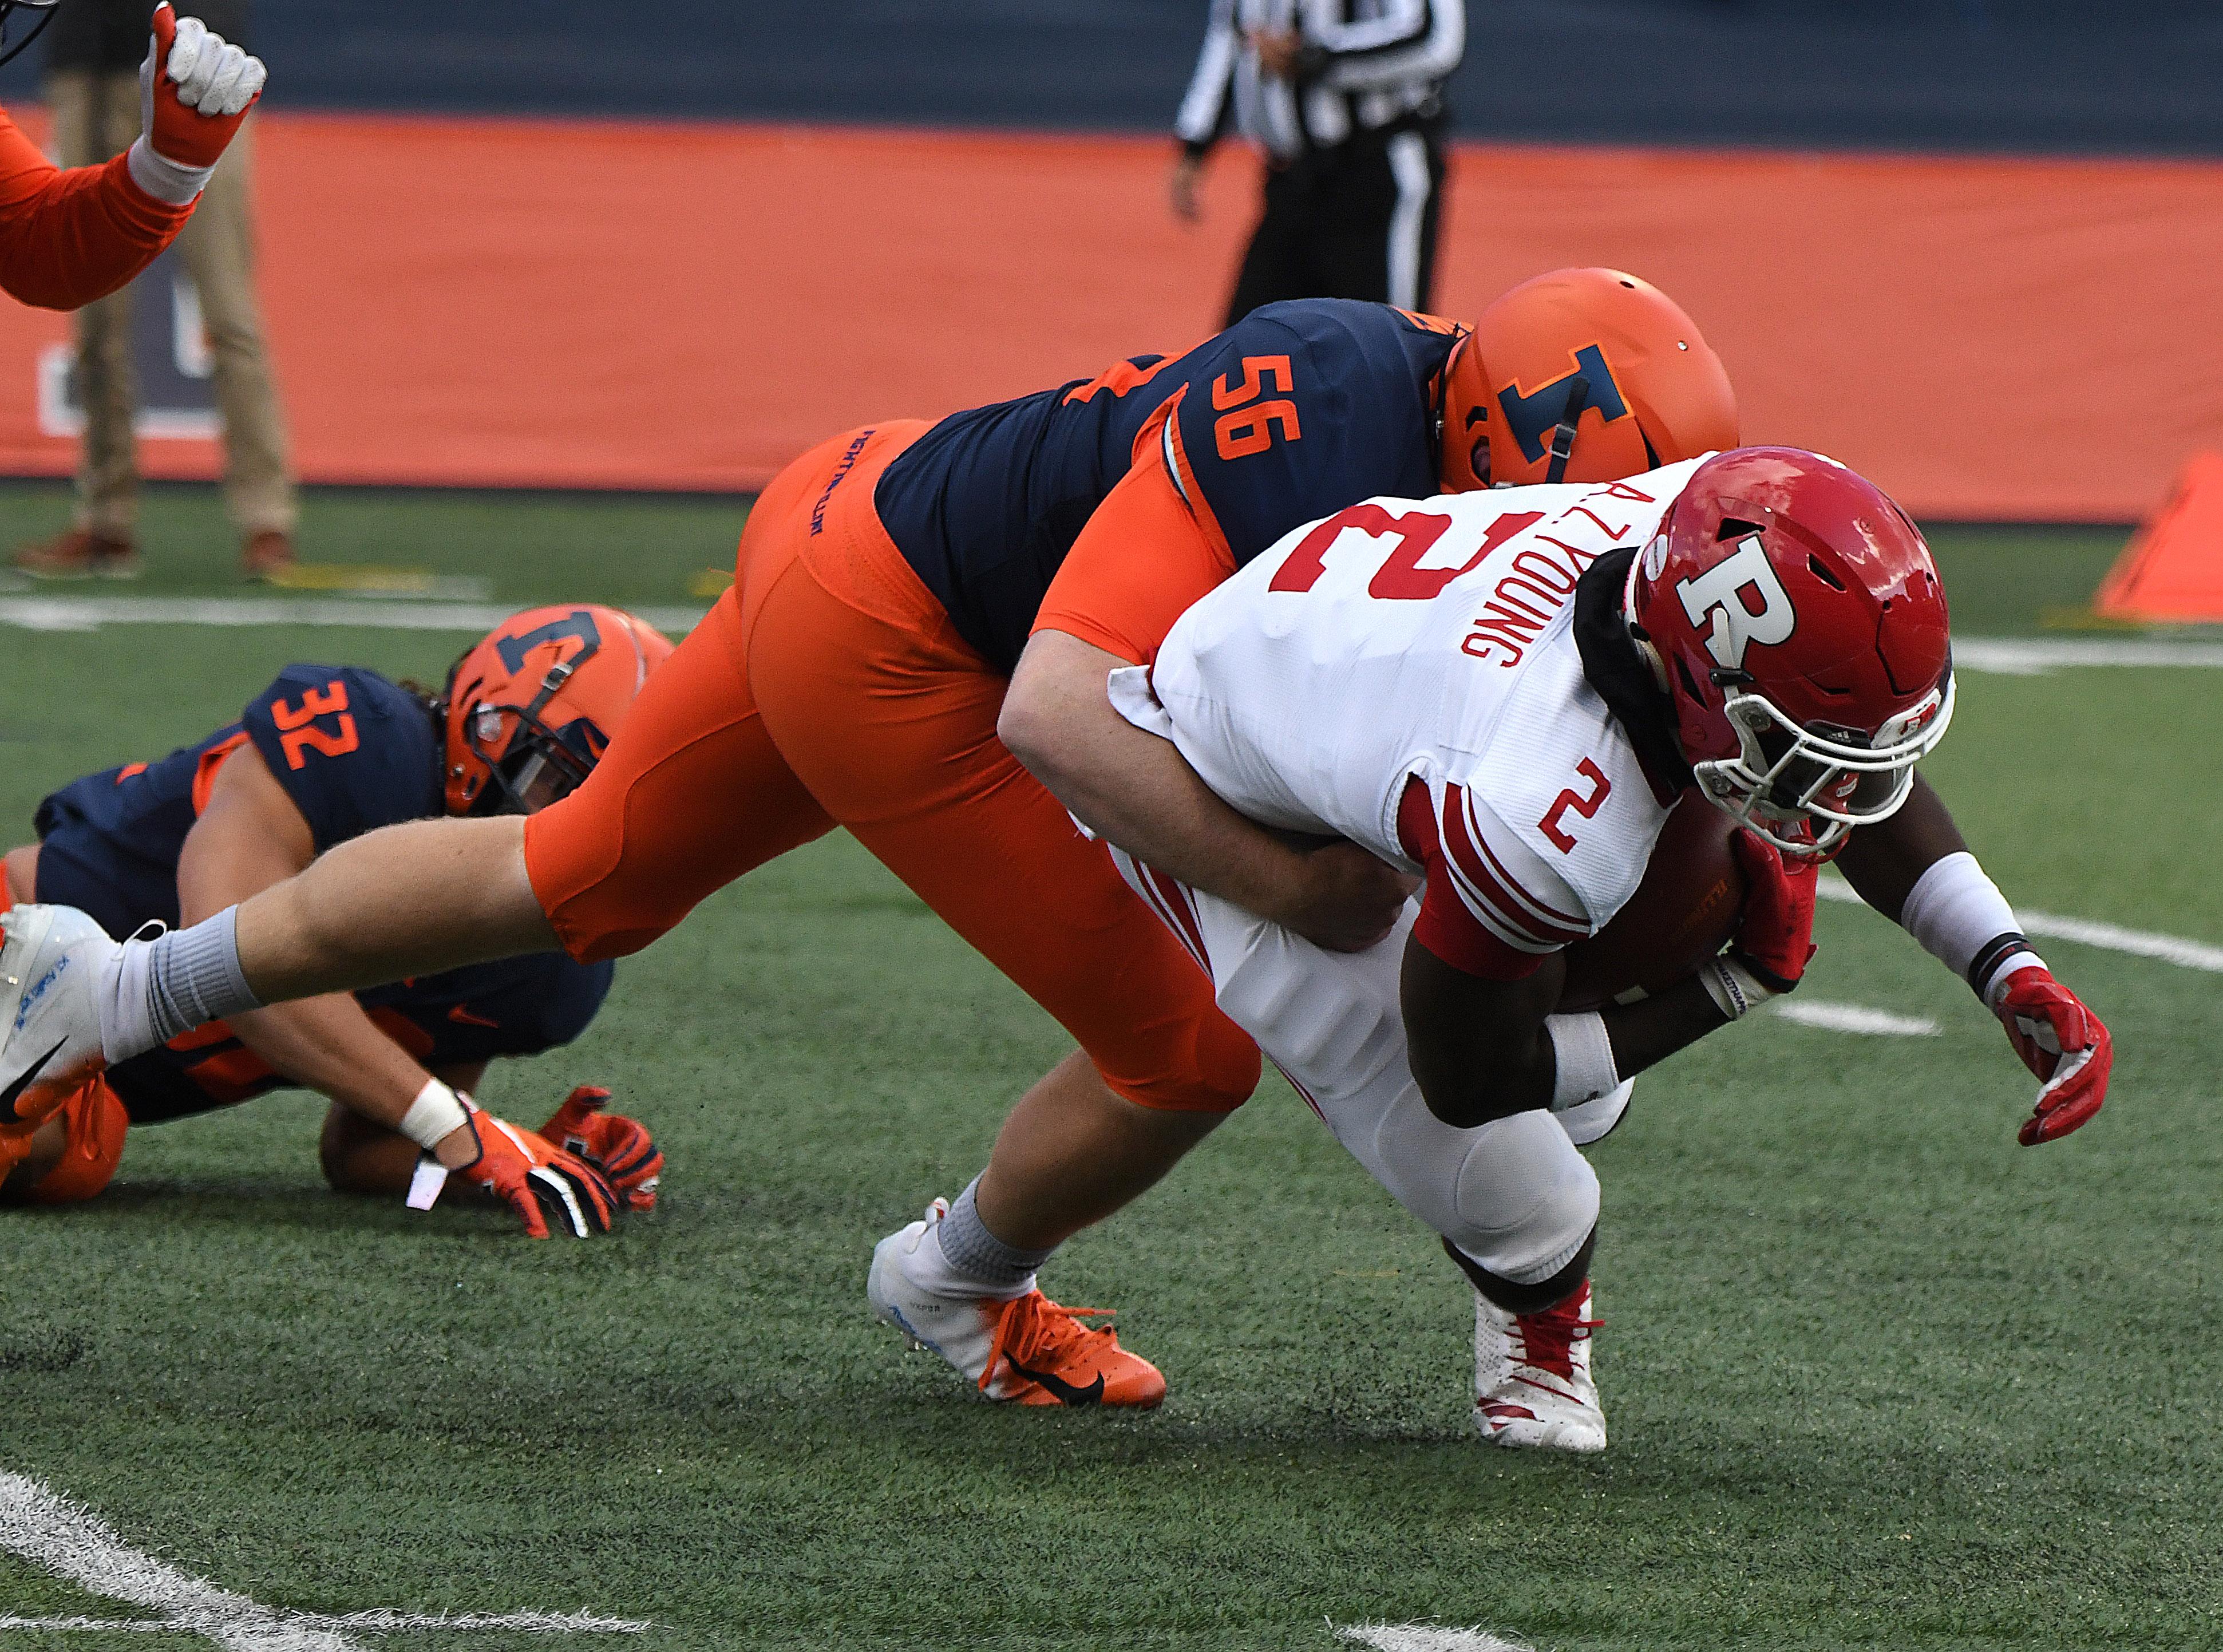 COLLEGE FOOTBALLL: NOV 02 Rutgers at Illinois